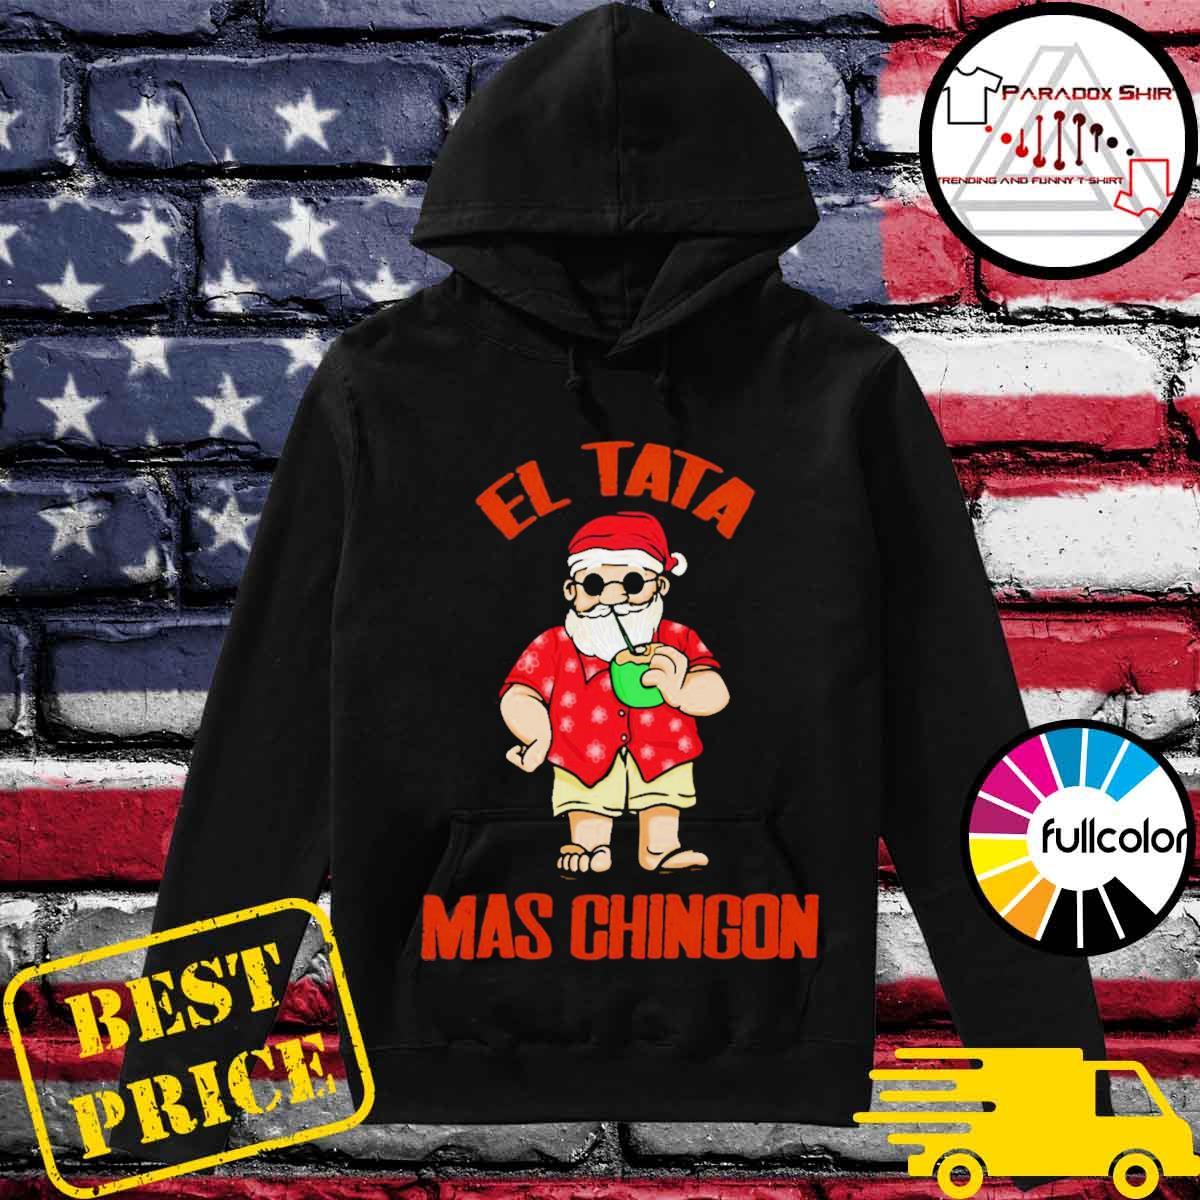 El tata mas Chingon Santa claus s Hoodie